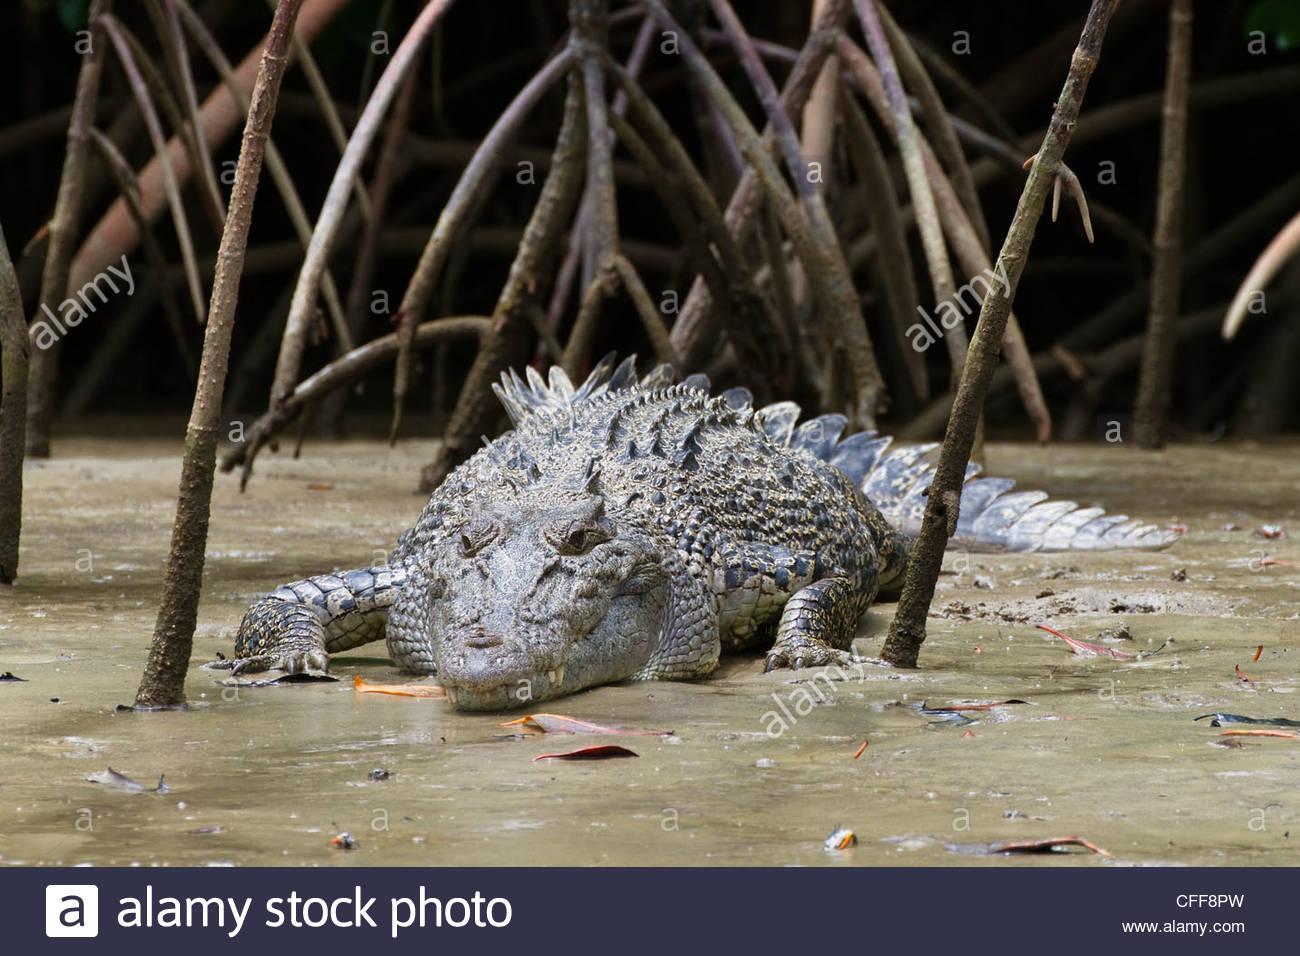 Estuarine Crocodile sunbathing amidst roots of mangroves, Crocodylus porosus, Daintree National Park, Queensland, - Stock Image